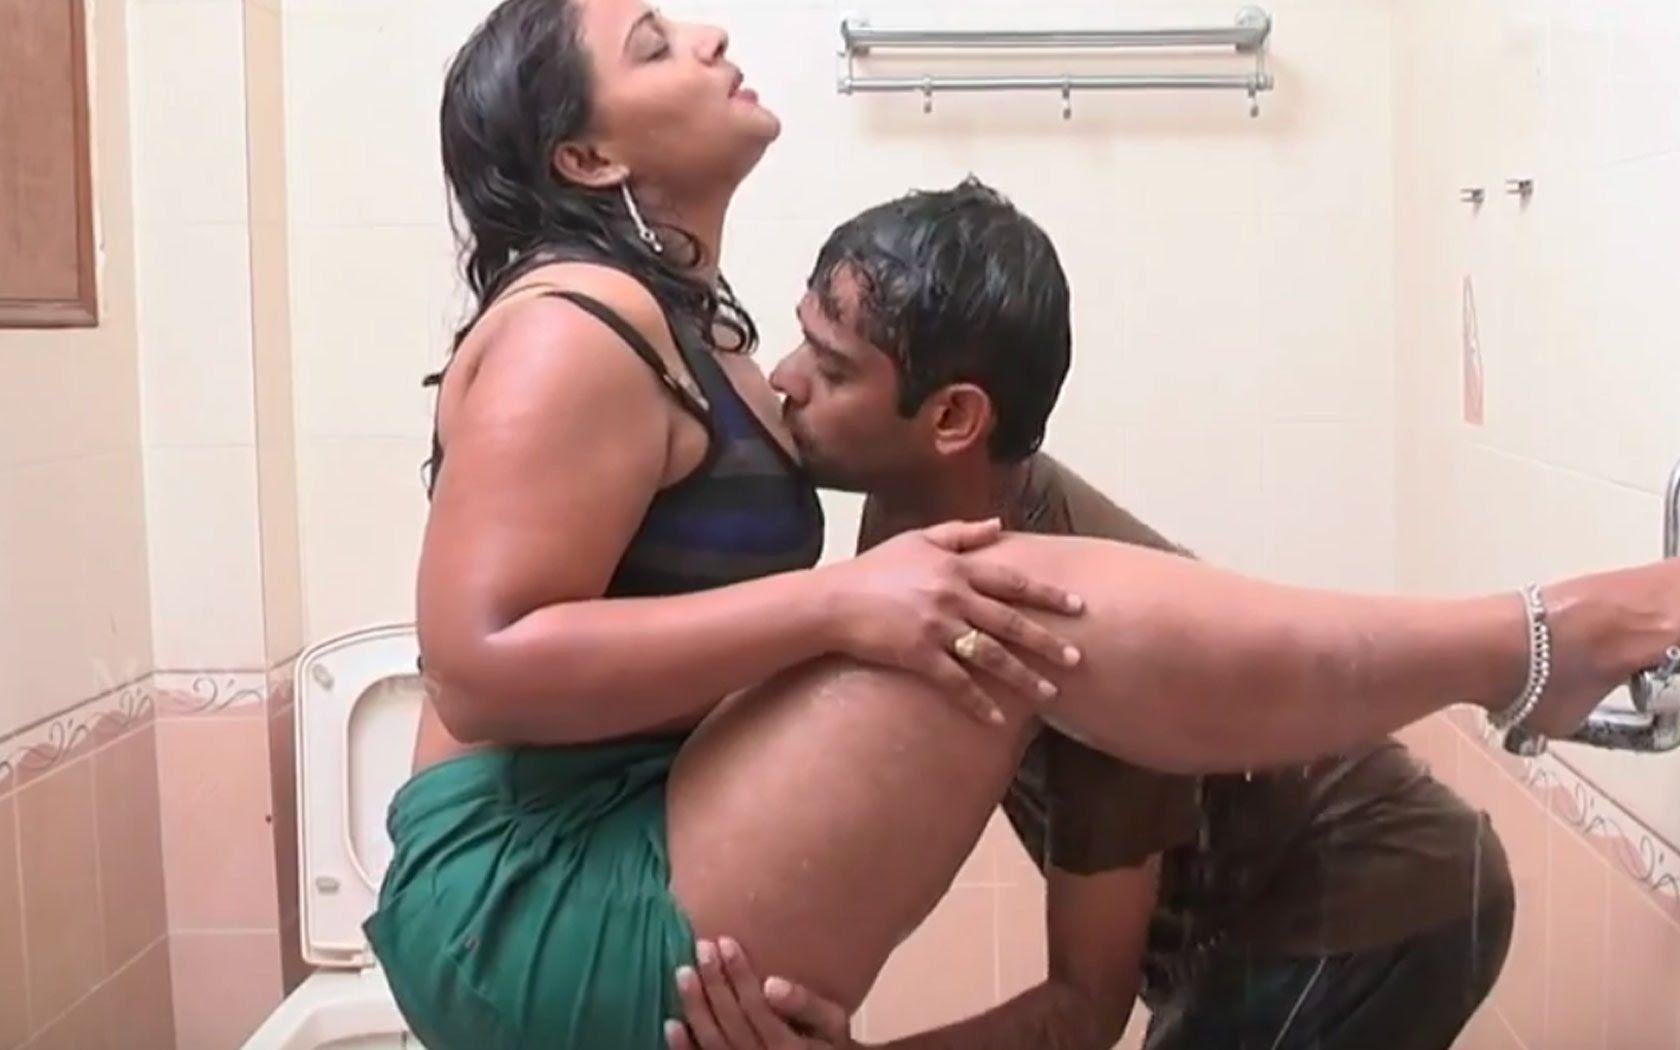 Bathroom Rs In Sex Hot 3